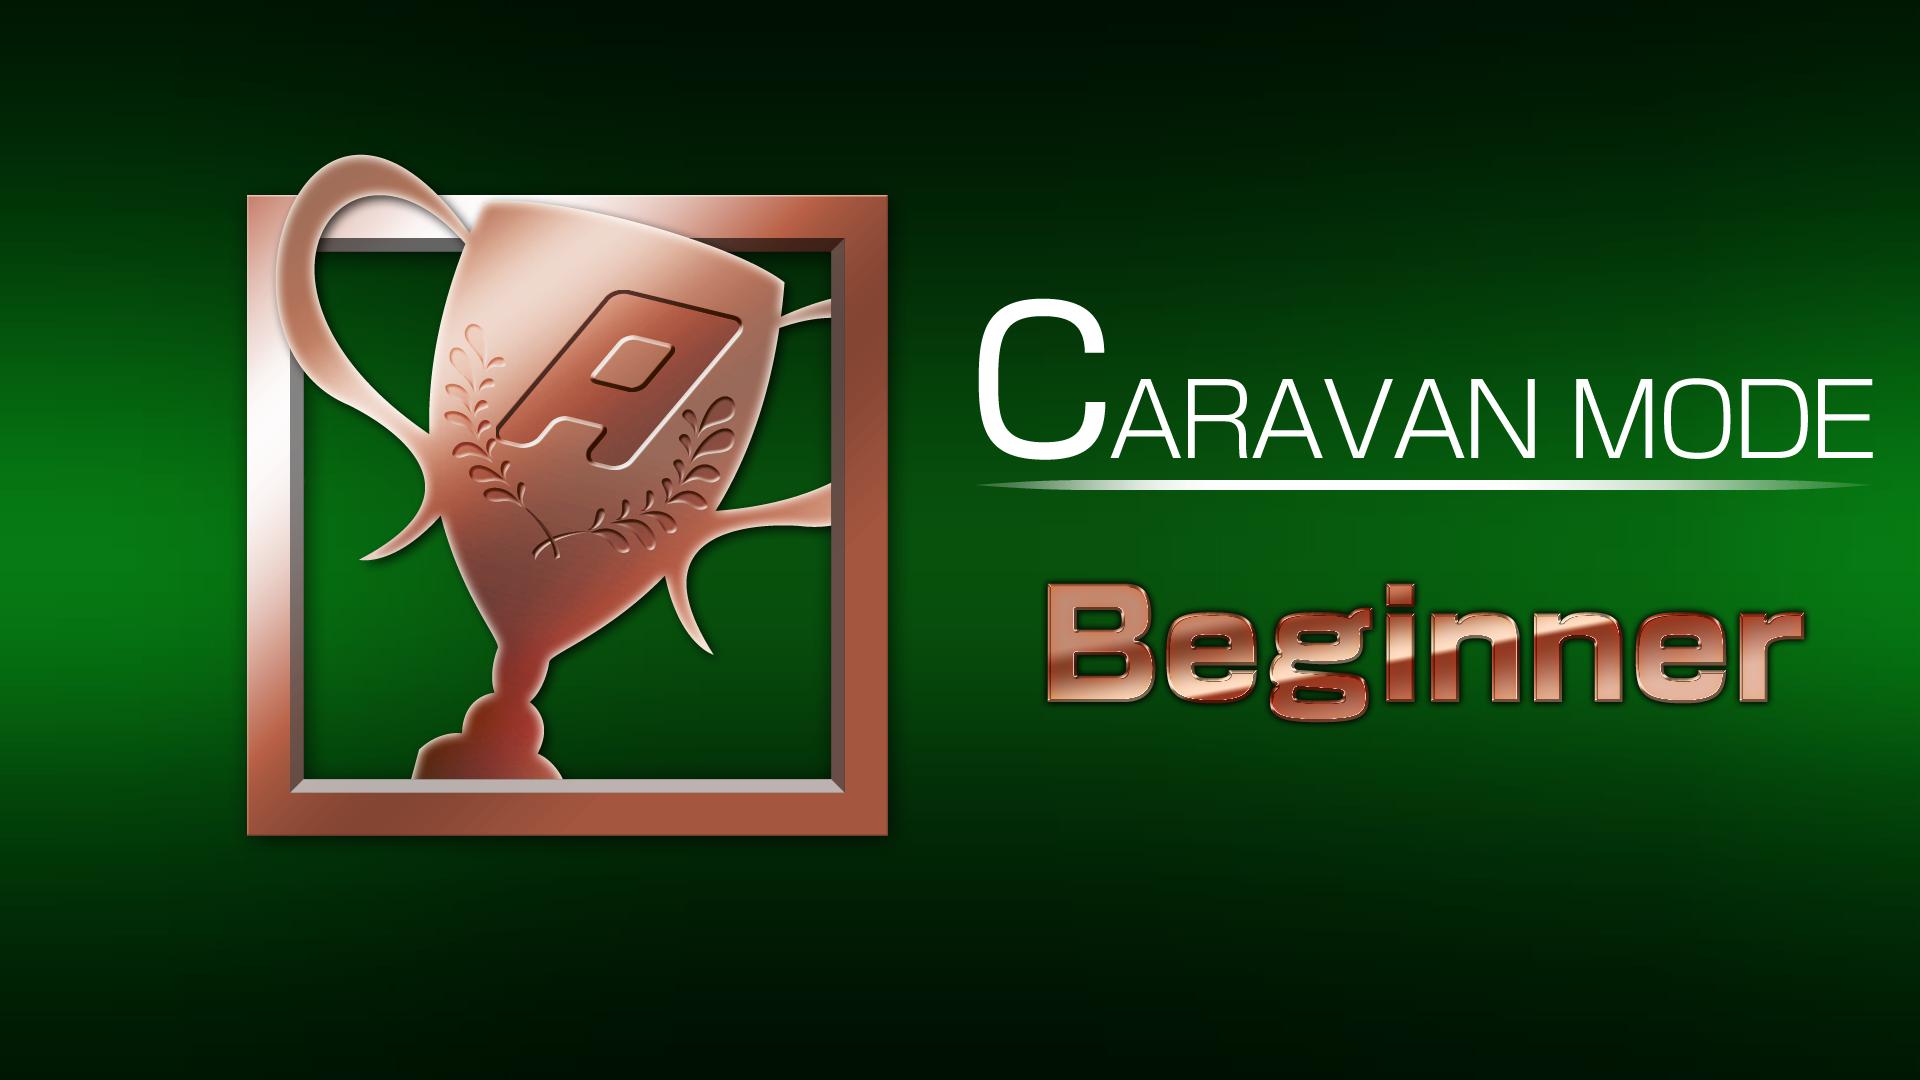 Icon for CARAVAN MODE 5,000 points